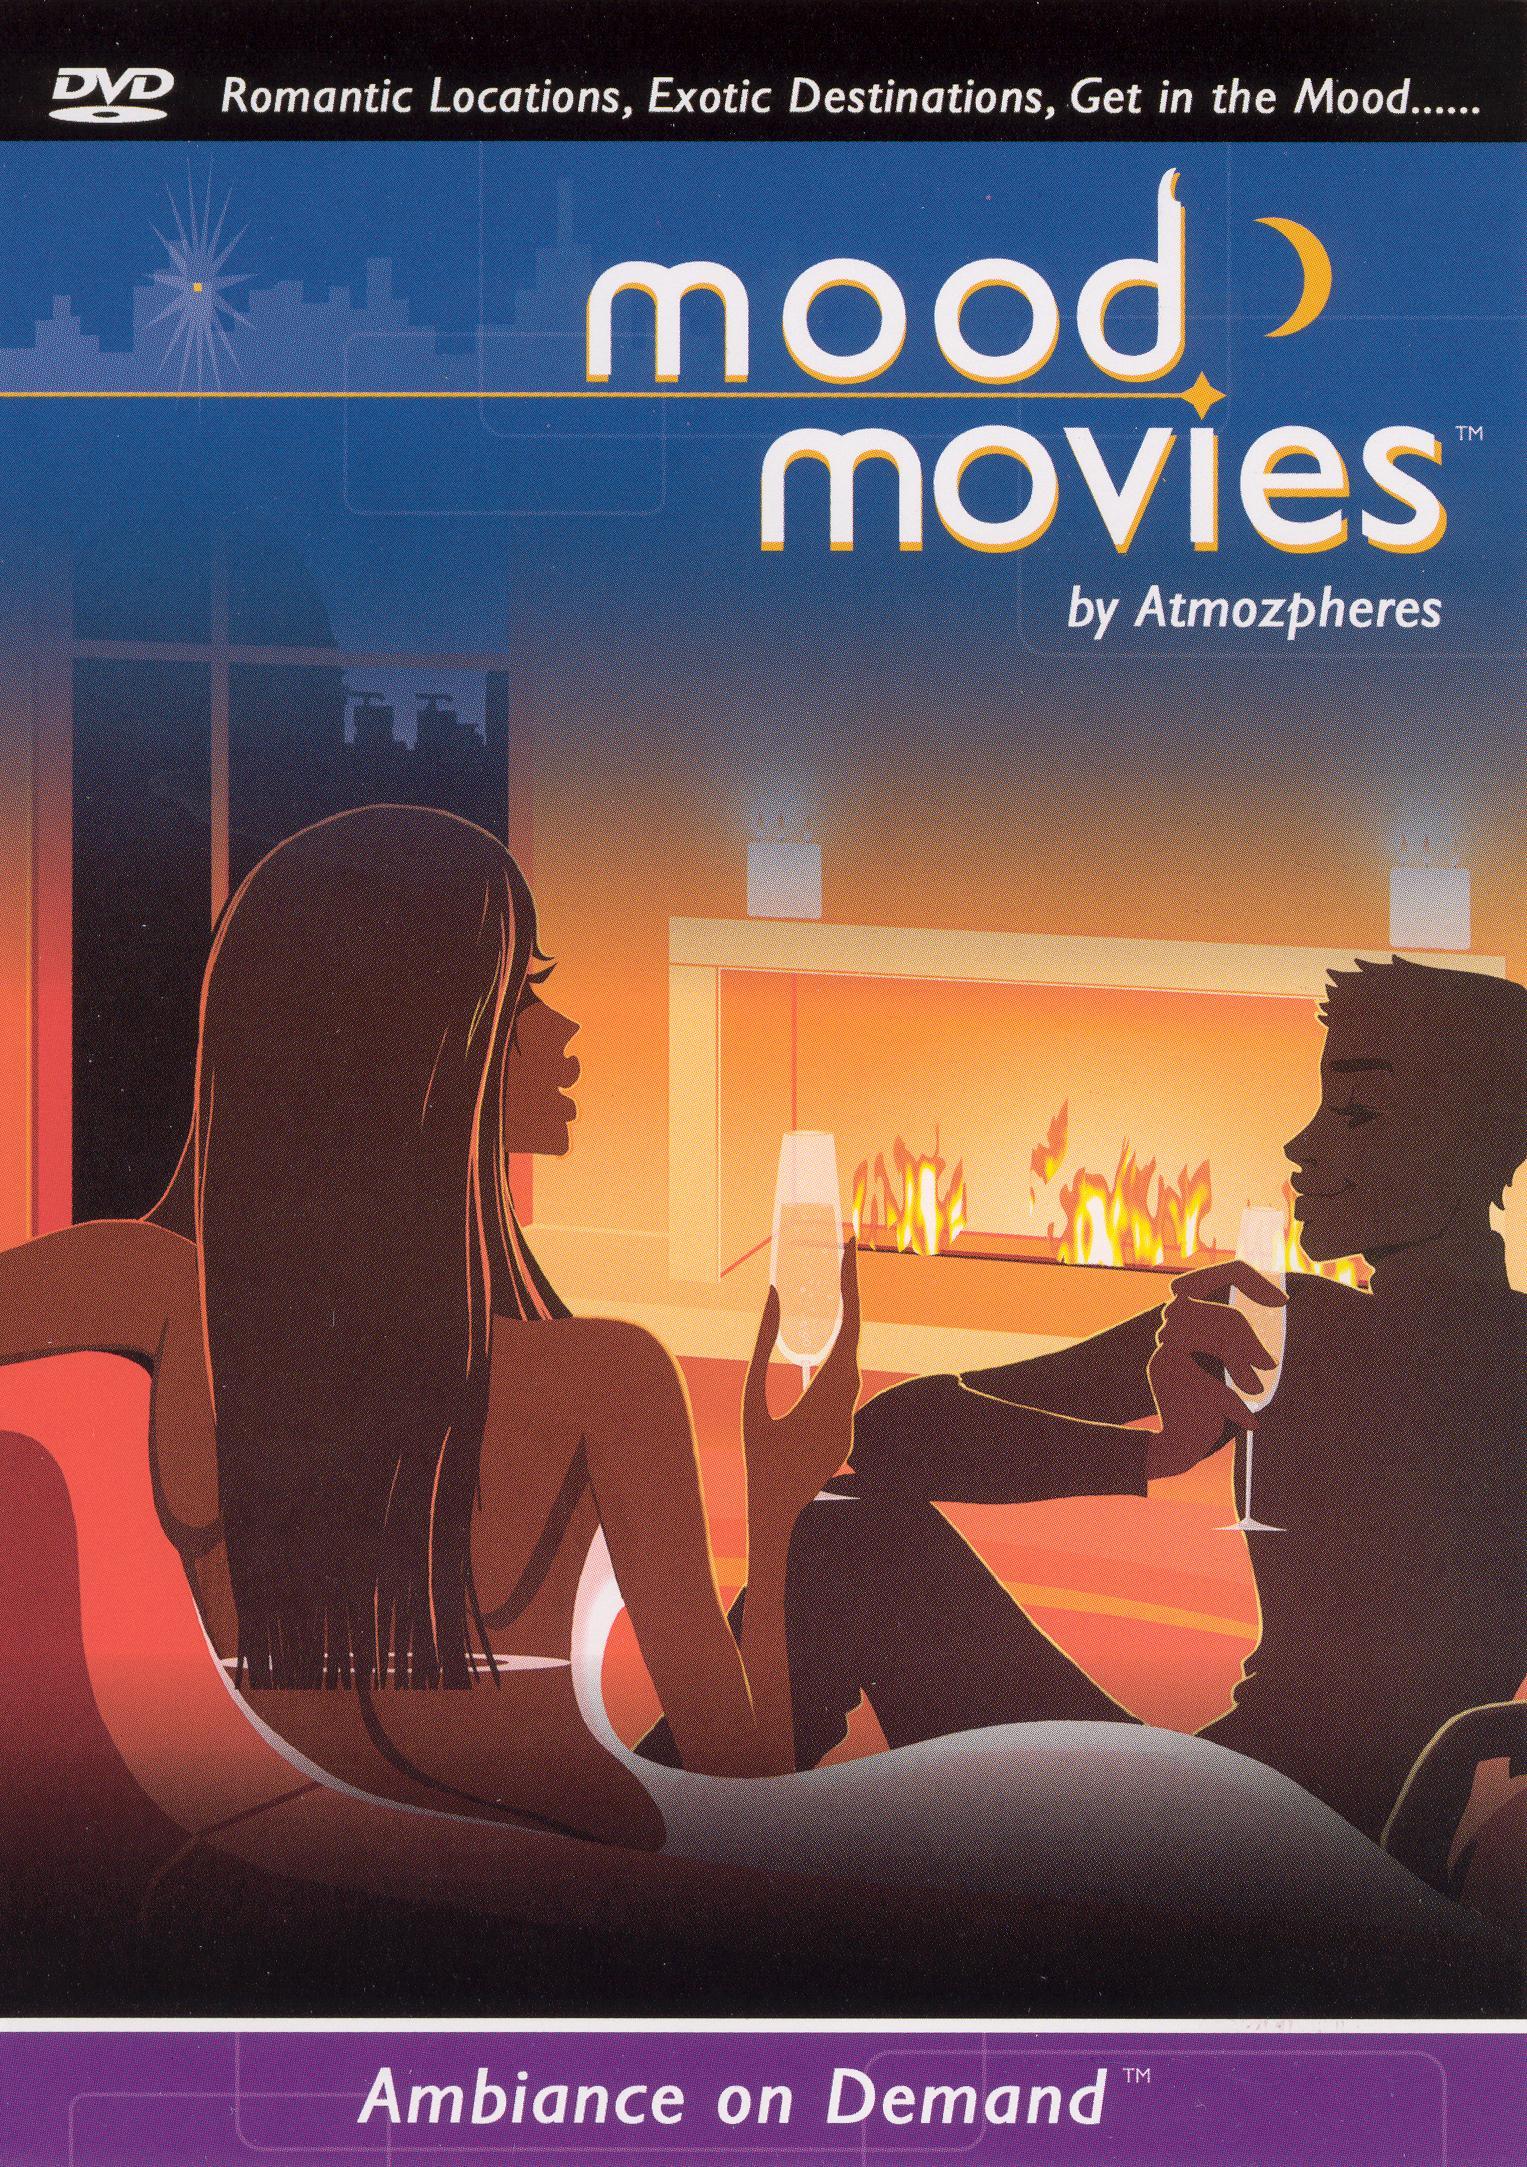 Ambiance on Demand: Mood Movies